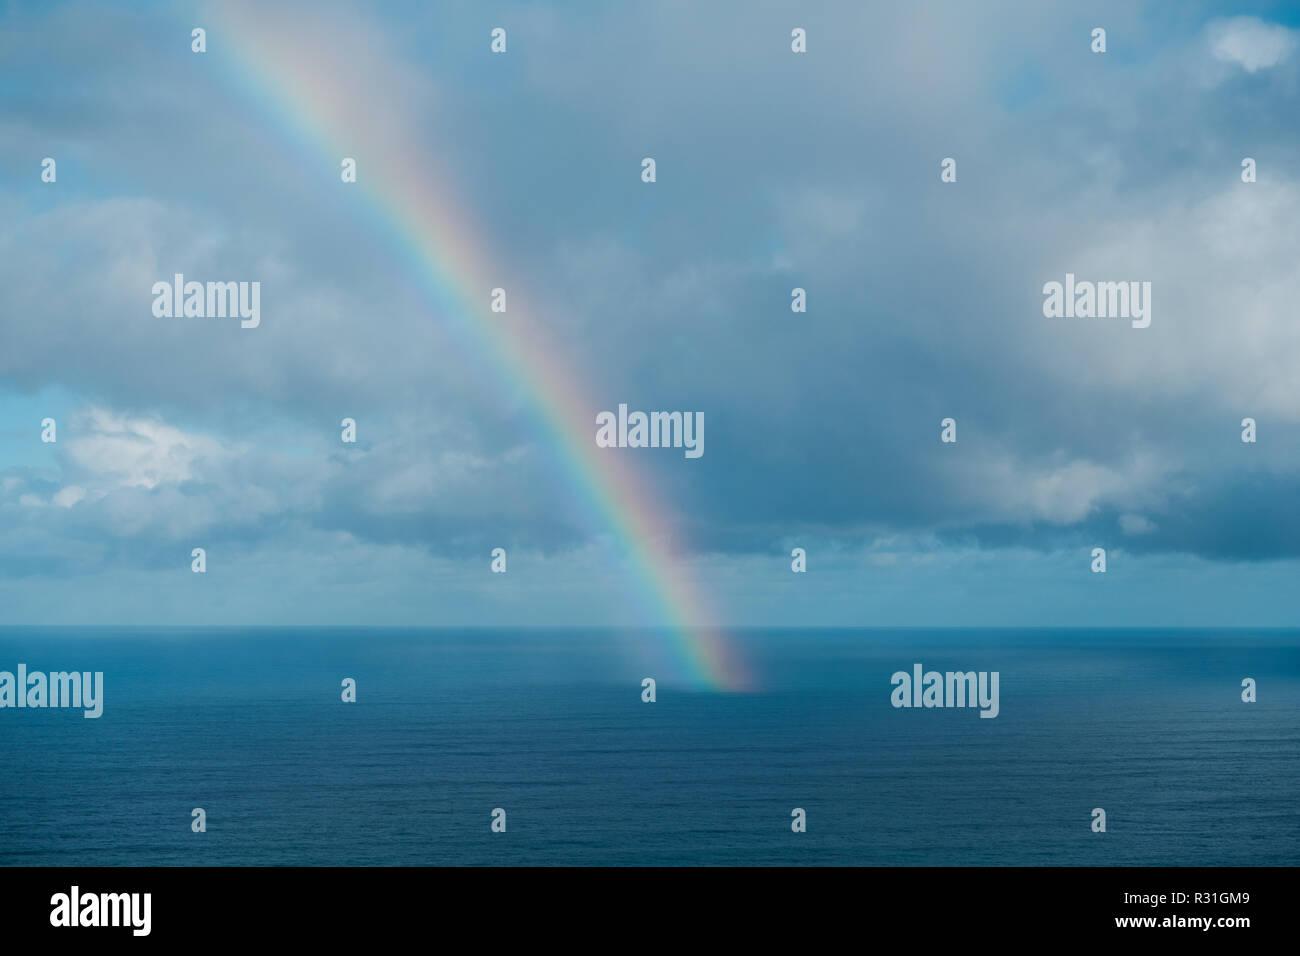 rainbow on ocean, rainbow ending on ocean - Stock Image